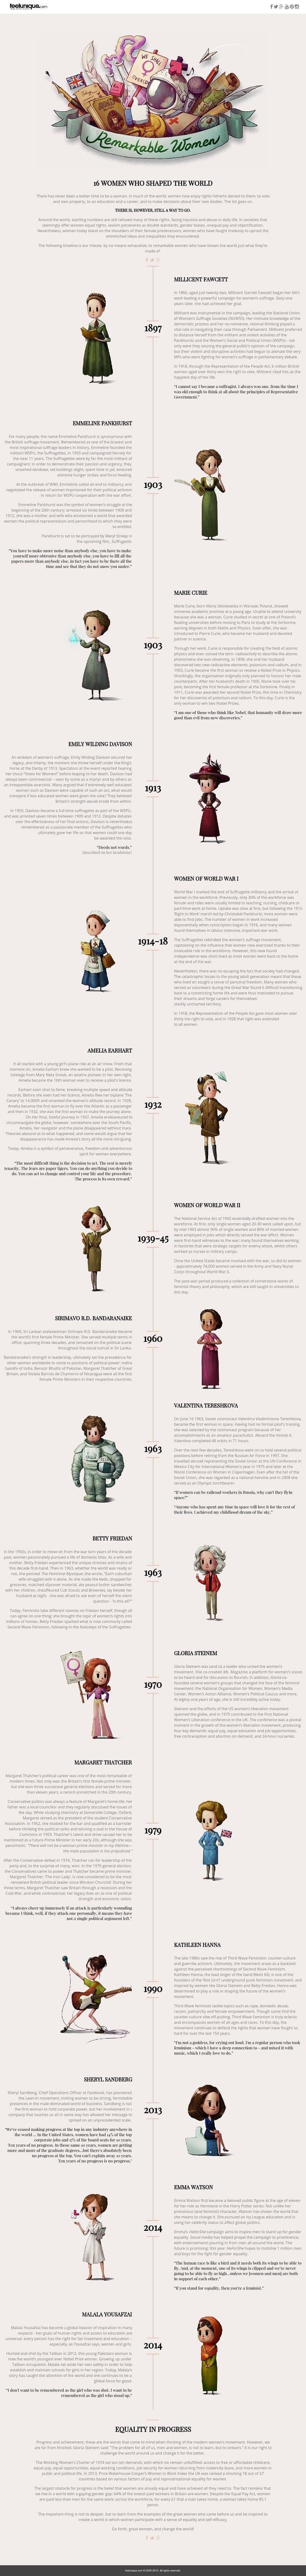 16 remarkable women